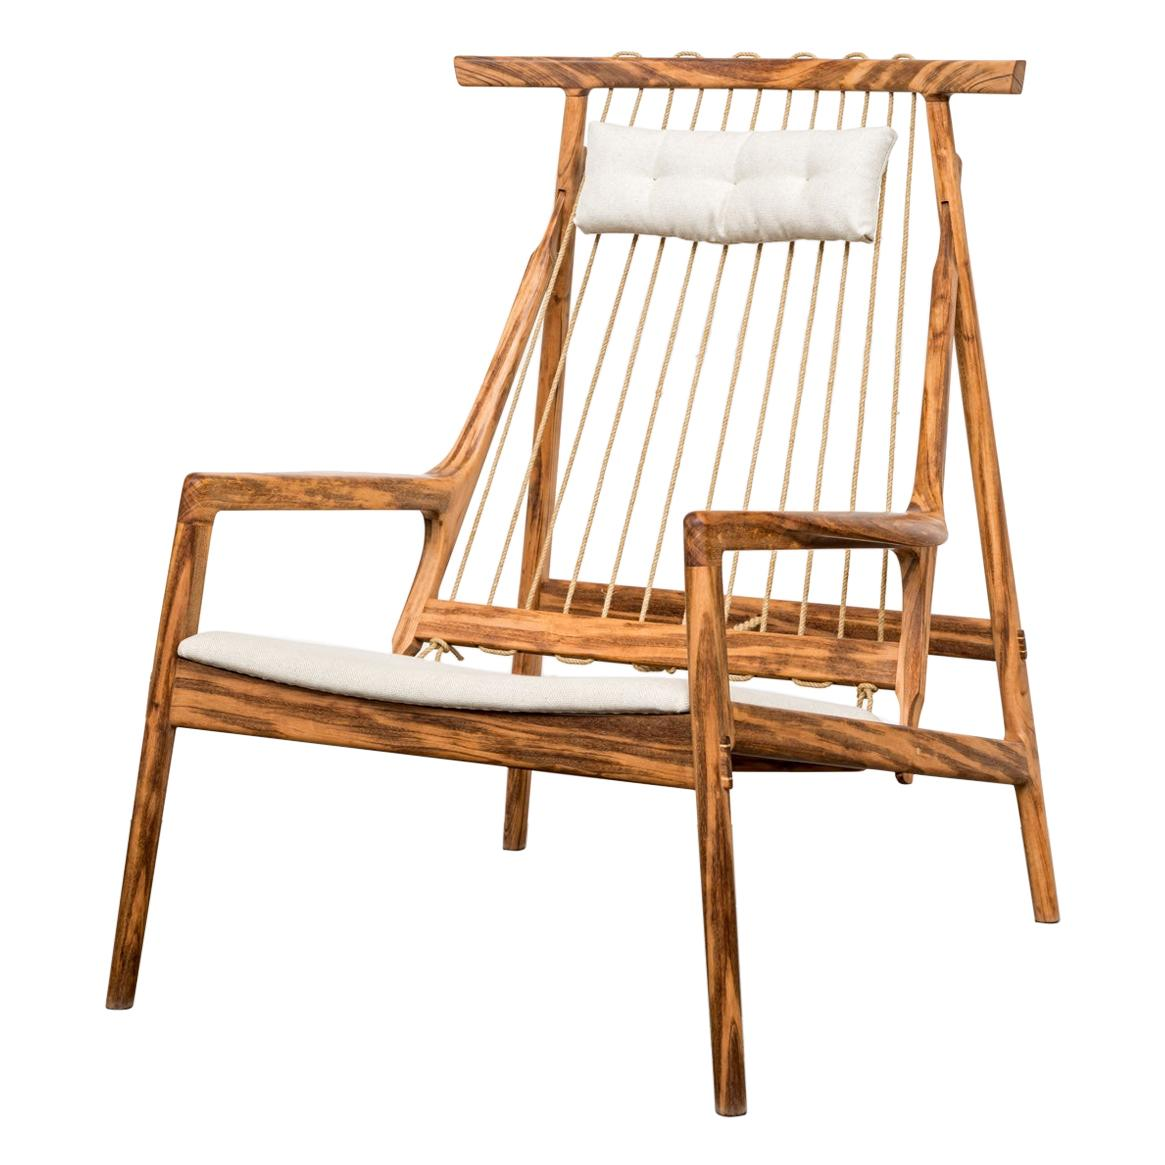 Contemporary Armchair in Brazilian Hardwood by Ricardo Graham Ferreira